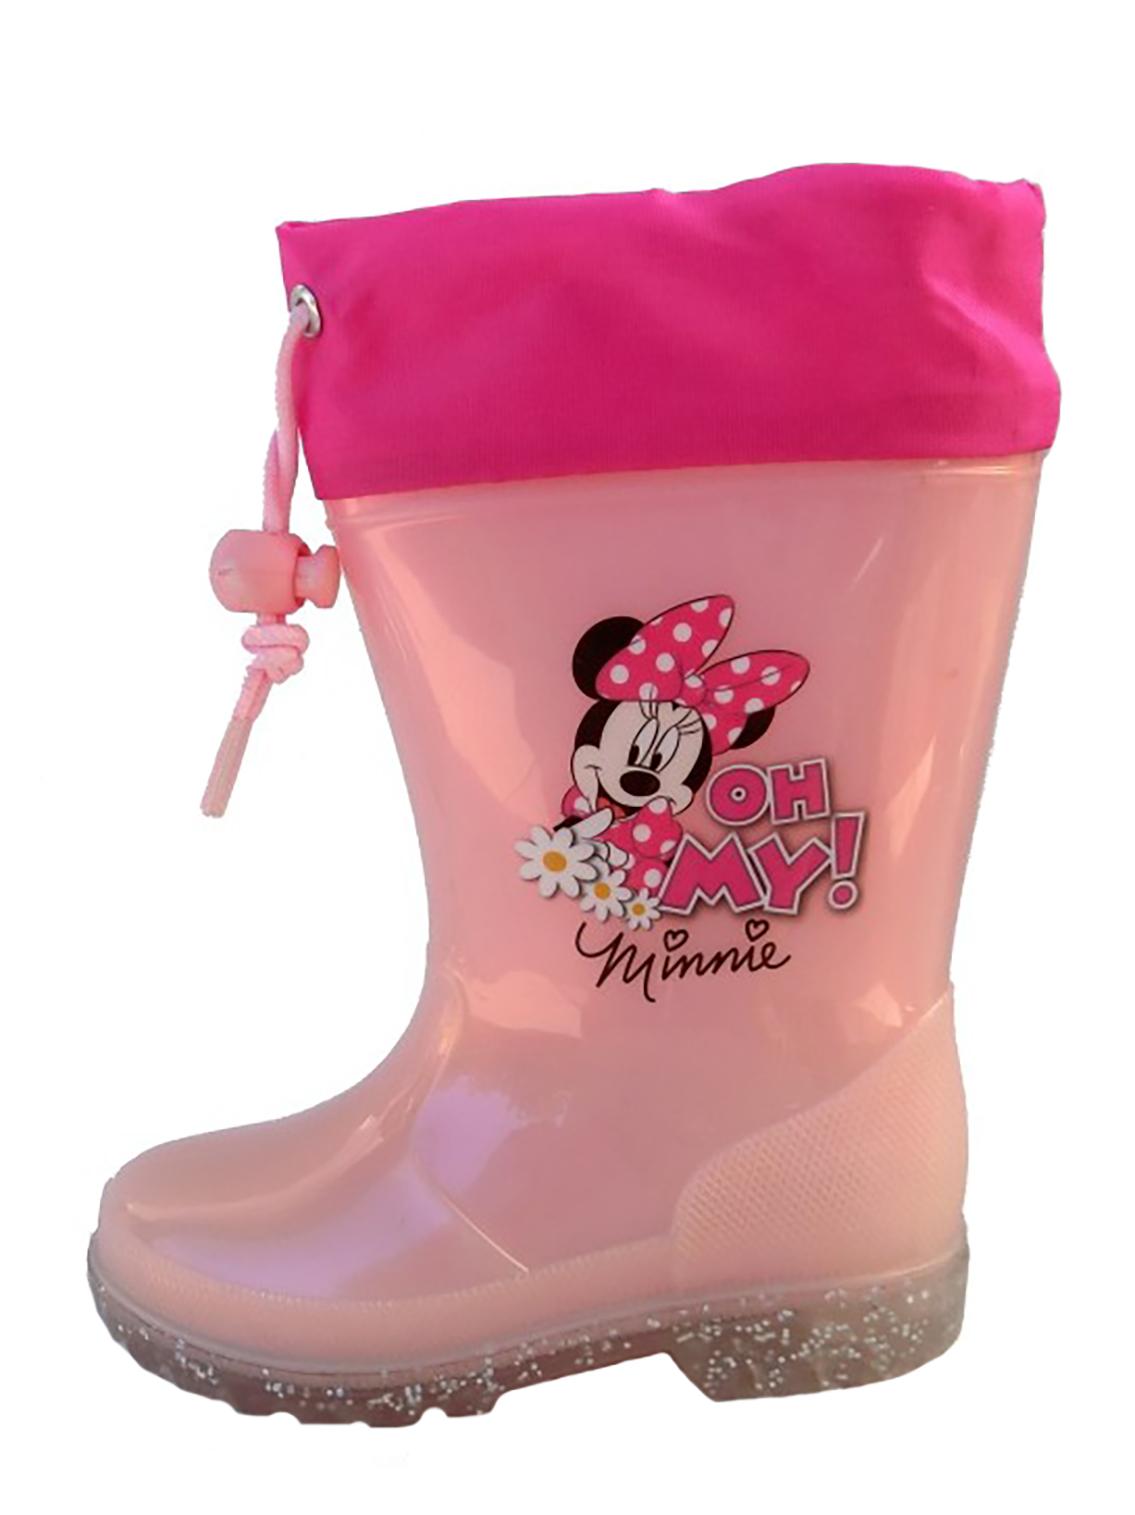 Stivali Pioggia Minnie bambina 23 24 25 26 27 28 29 Disney